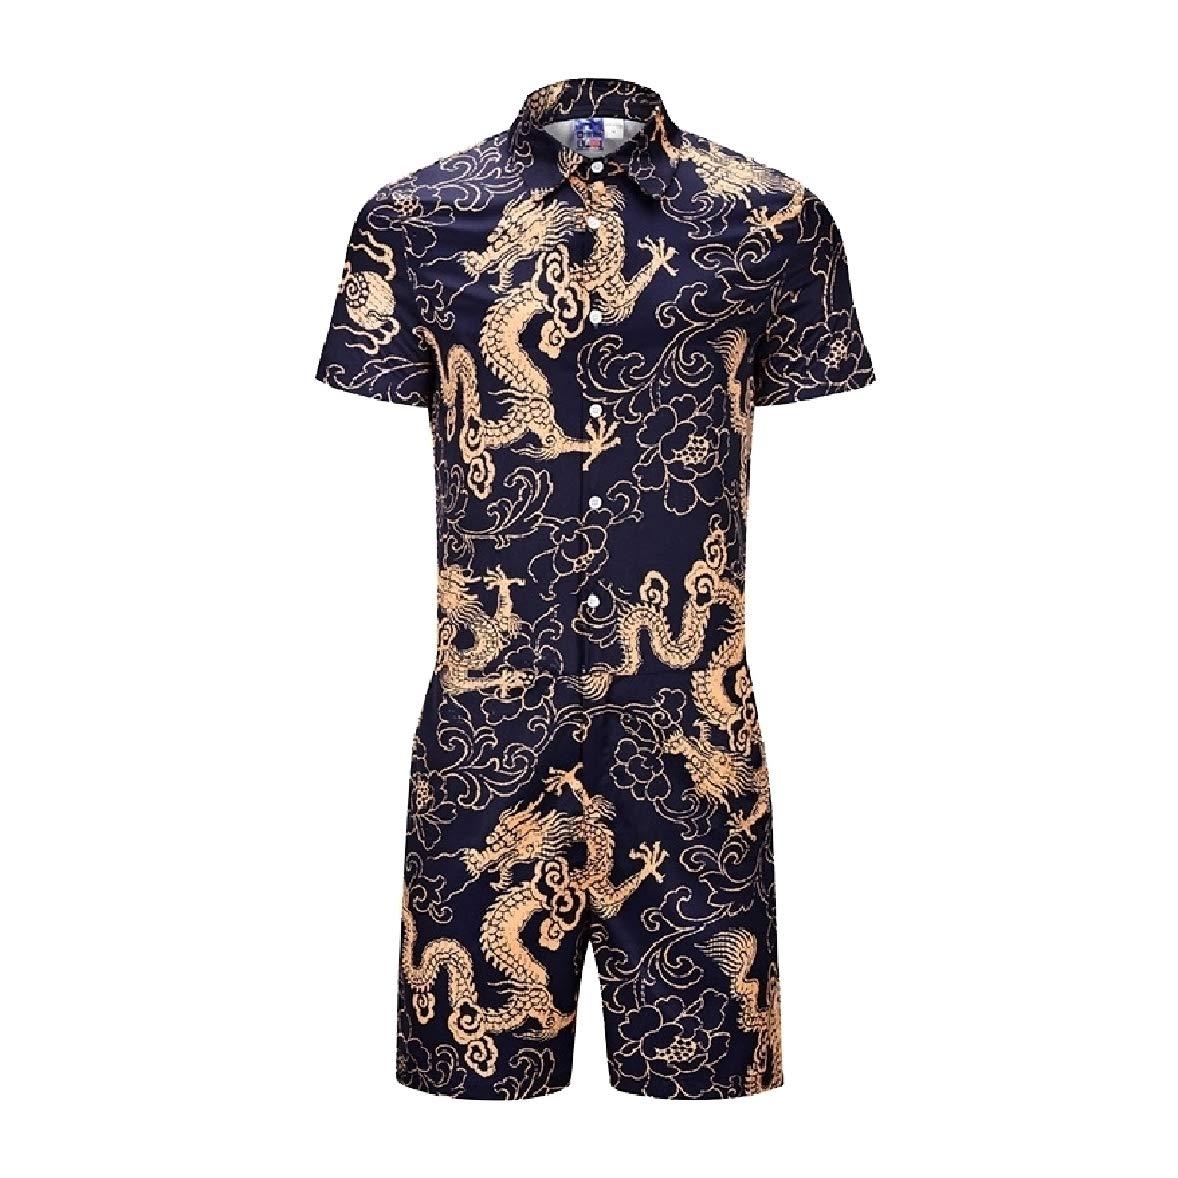 Zimaes-Men Summer Plus Size Short Sleeve Breathable Jumpsuits Romper